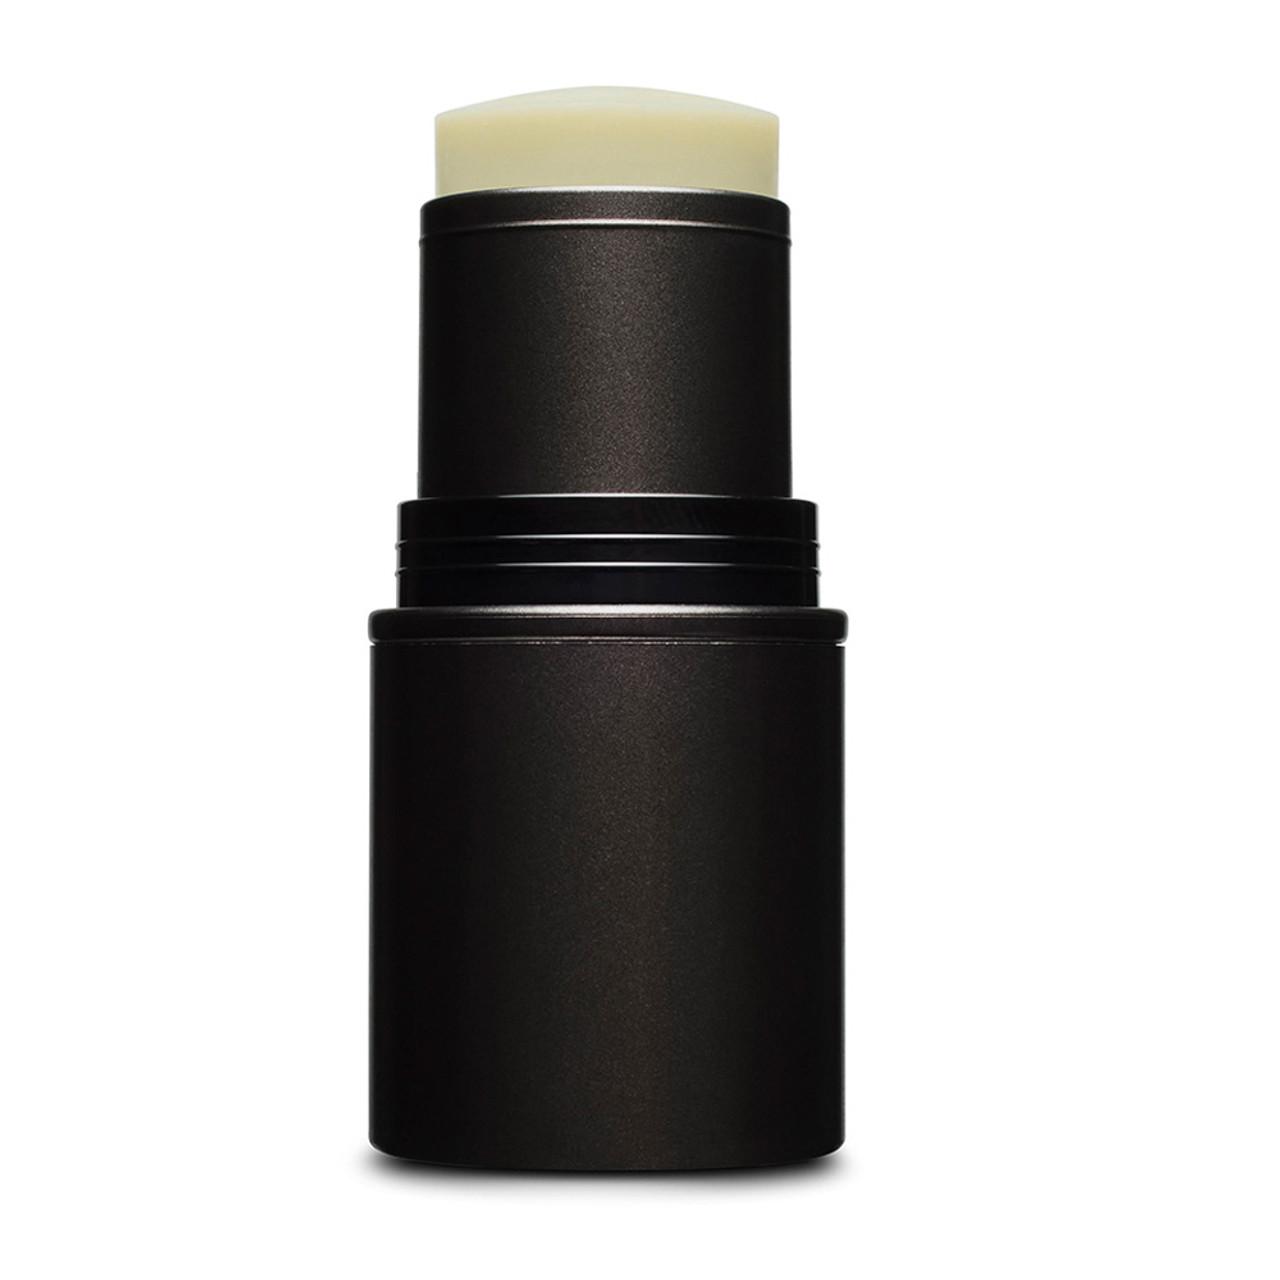 Eminence Rosehip & Lemongrass Lip Balm SPF 15 BeautifiedYou.com